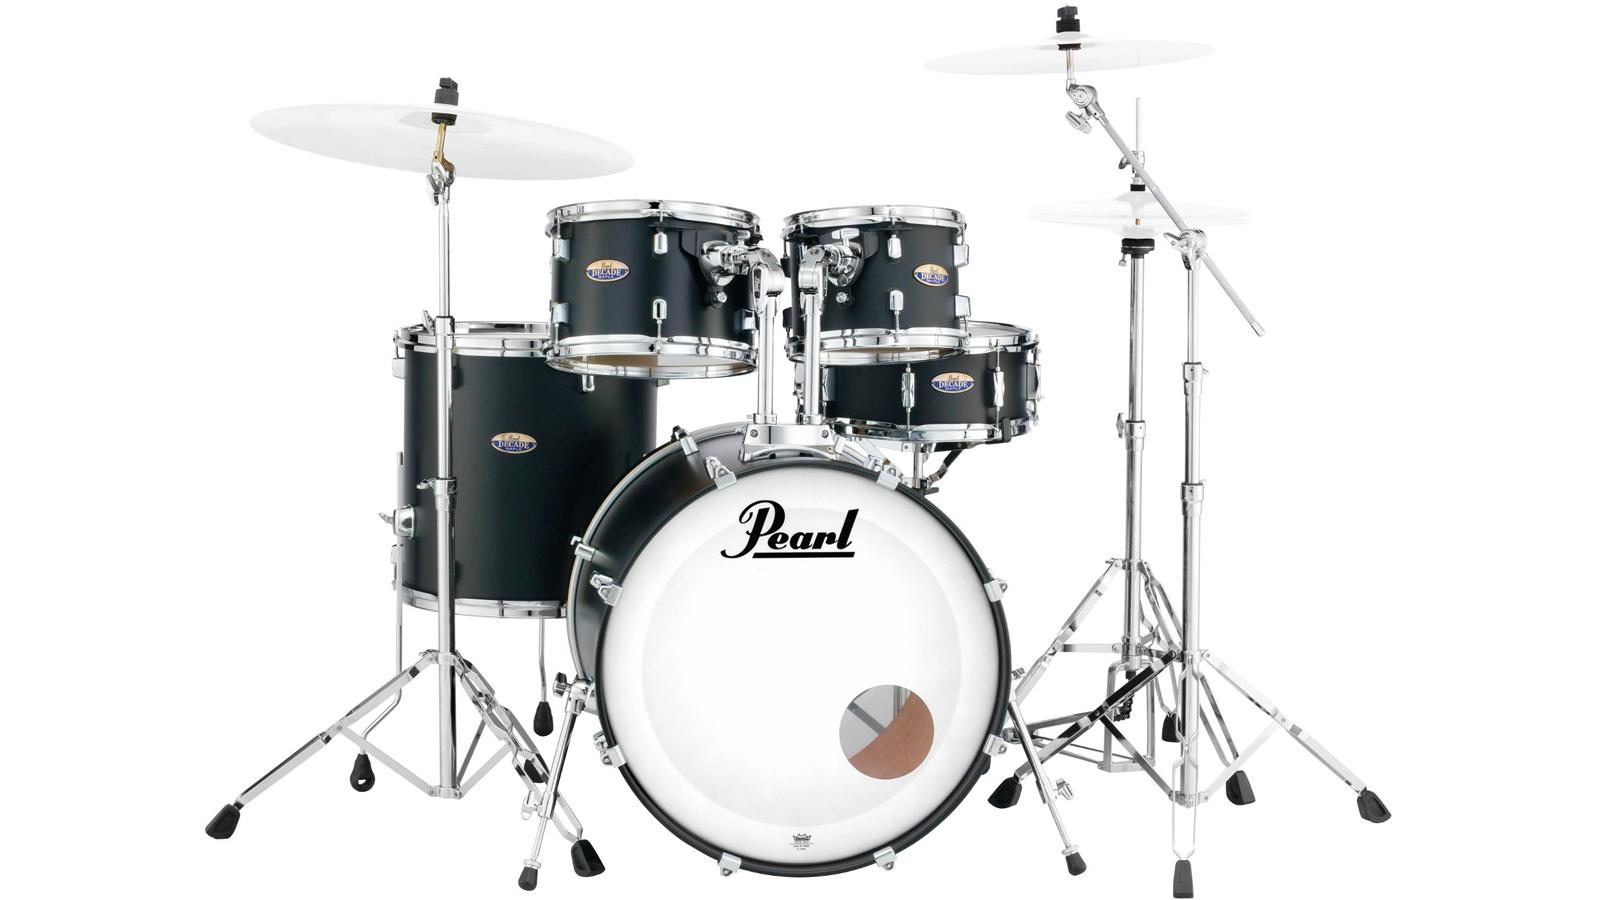 Pearl DMP925F/C227 Decade Maple Drumset